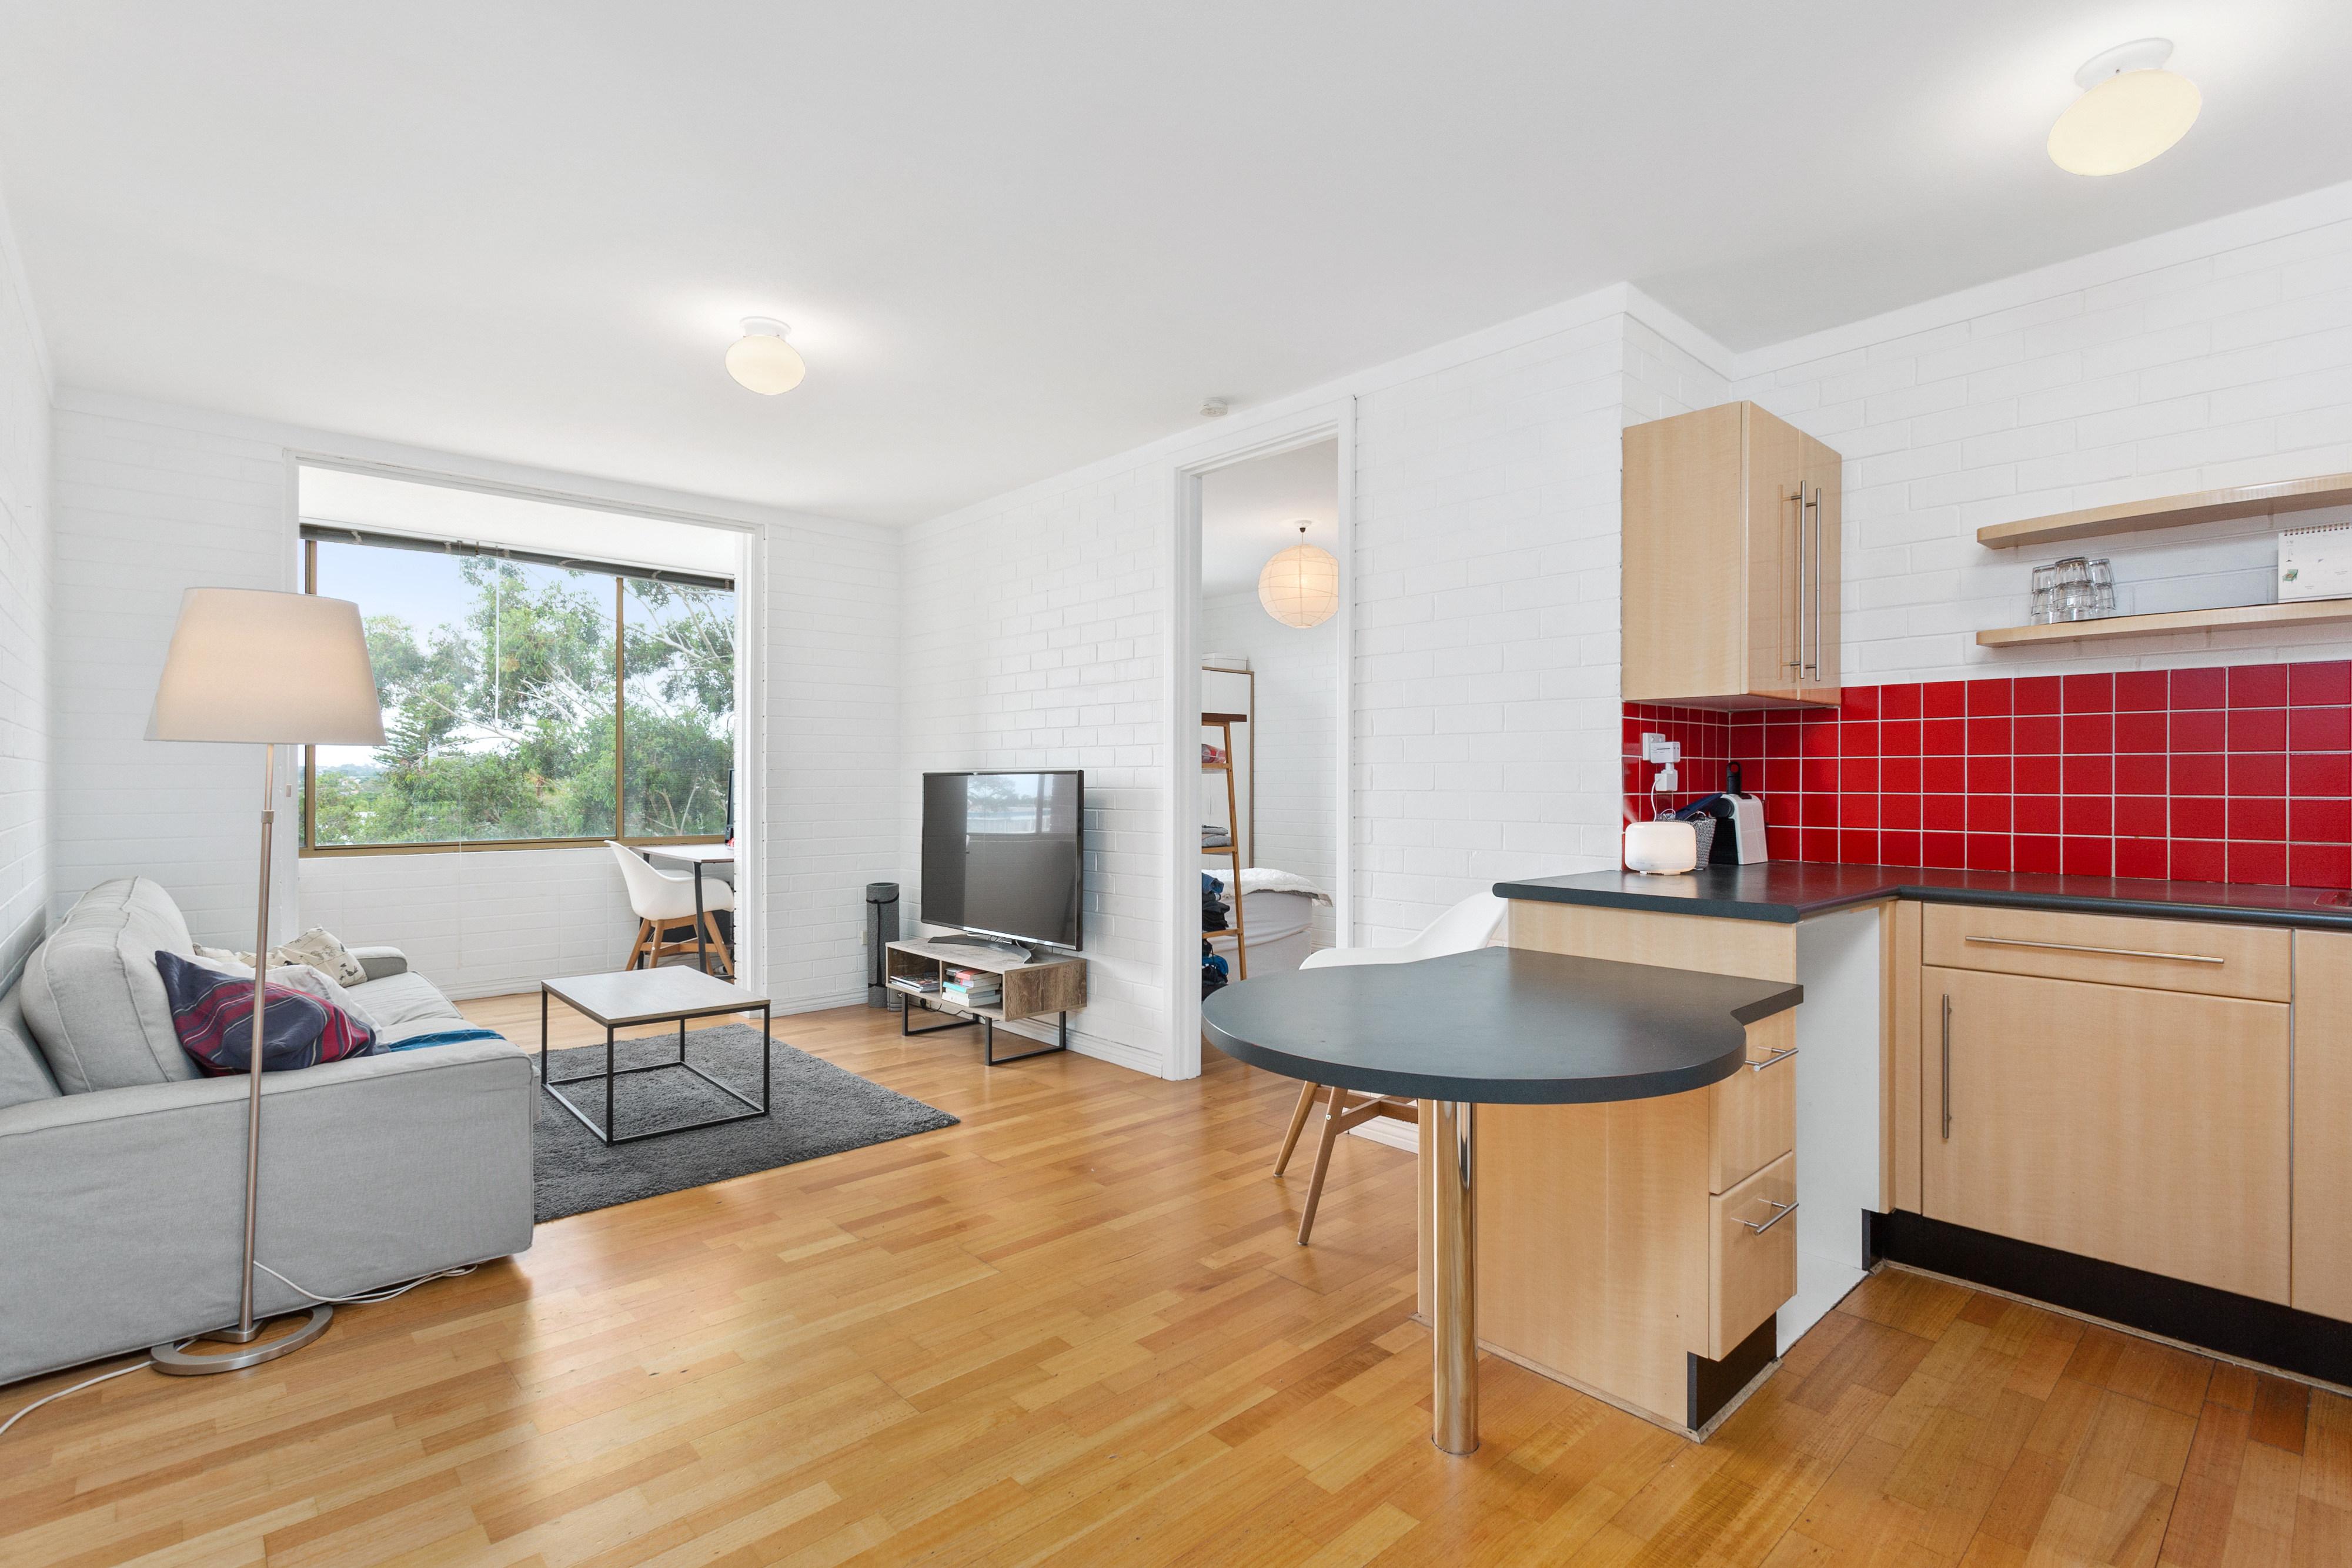 PRINT 54 66 Cleaver Street, West Perth 0